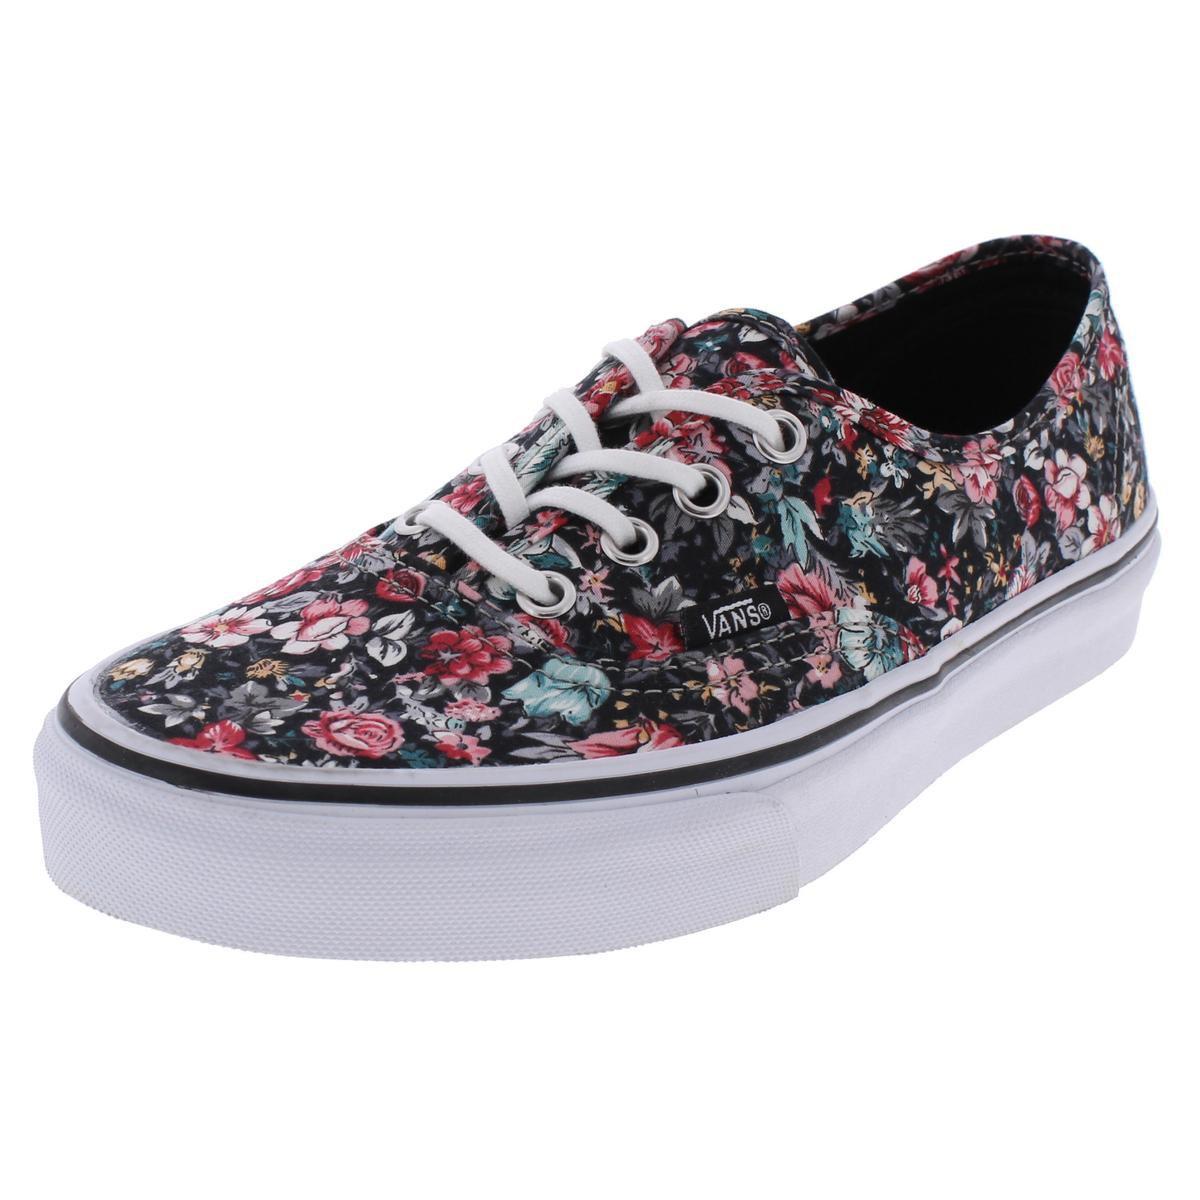 67101fd847 Lyst - Vans Authentic Low Top Floral Print Casual Shoes